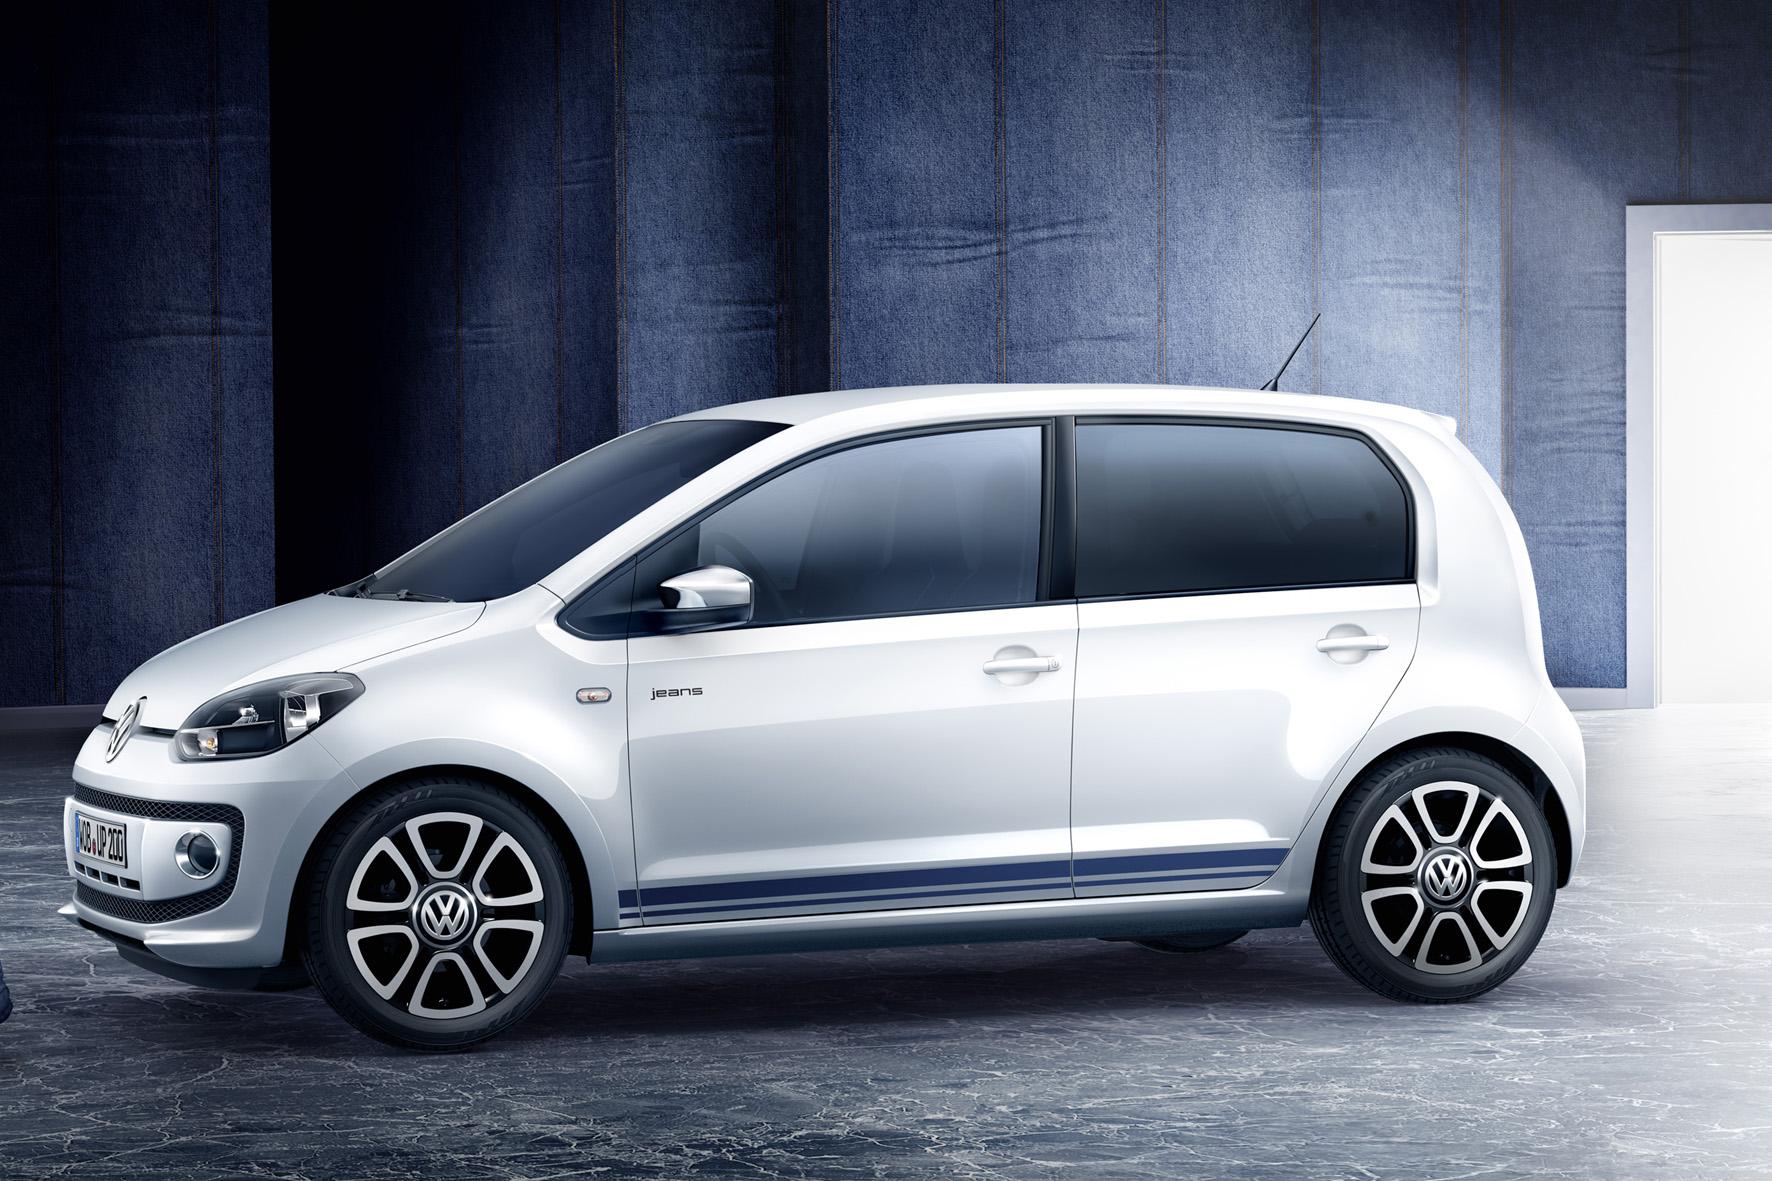 VW-Stadtflitzer als Sondermodell